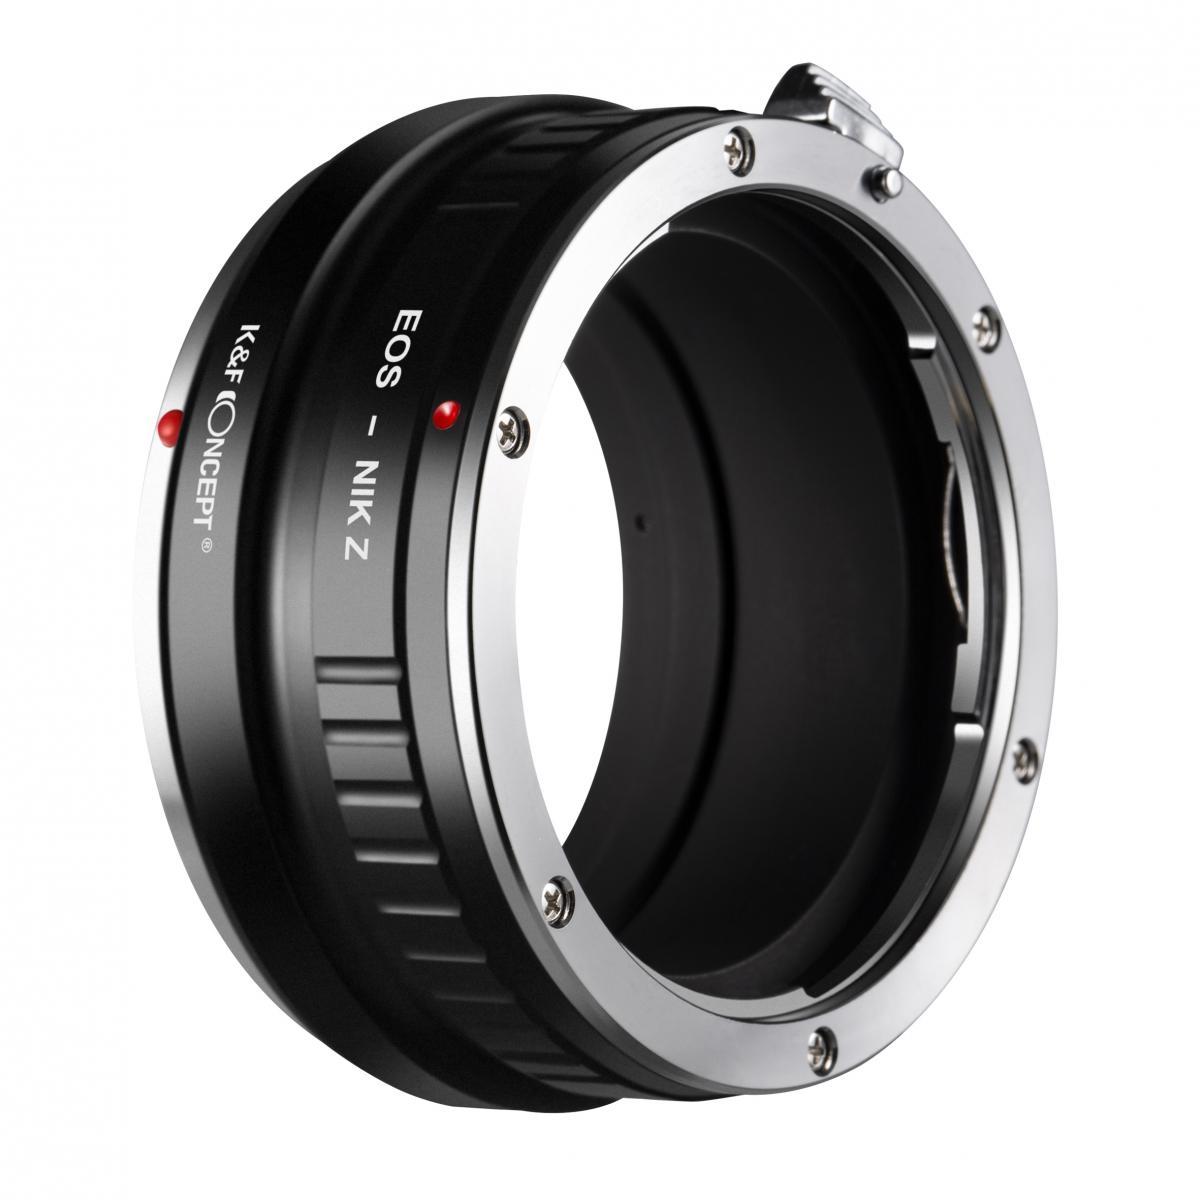 Z7 etc Mirrorless Cameras T2 Mount T-2 Lens to Nikon Z Mount for Nikon Z6